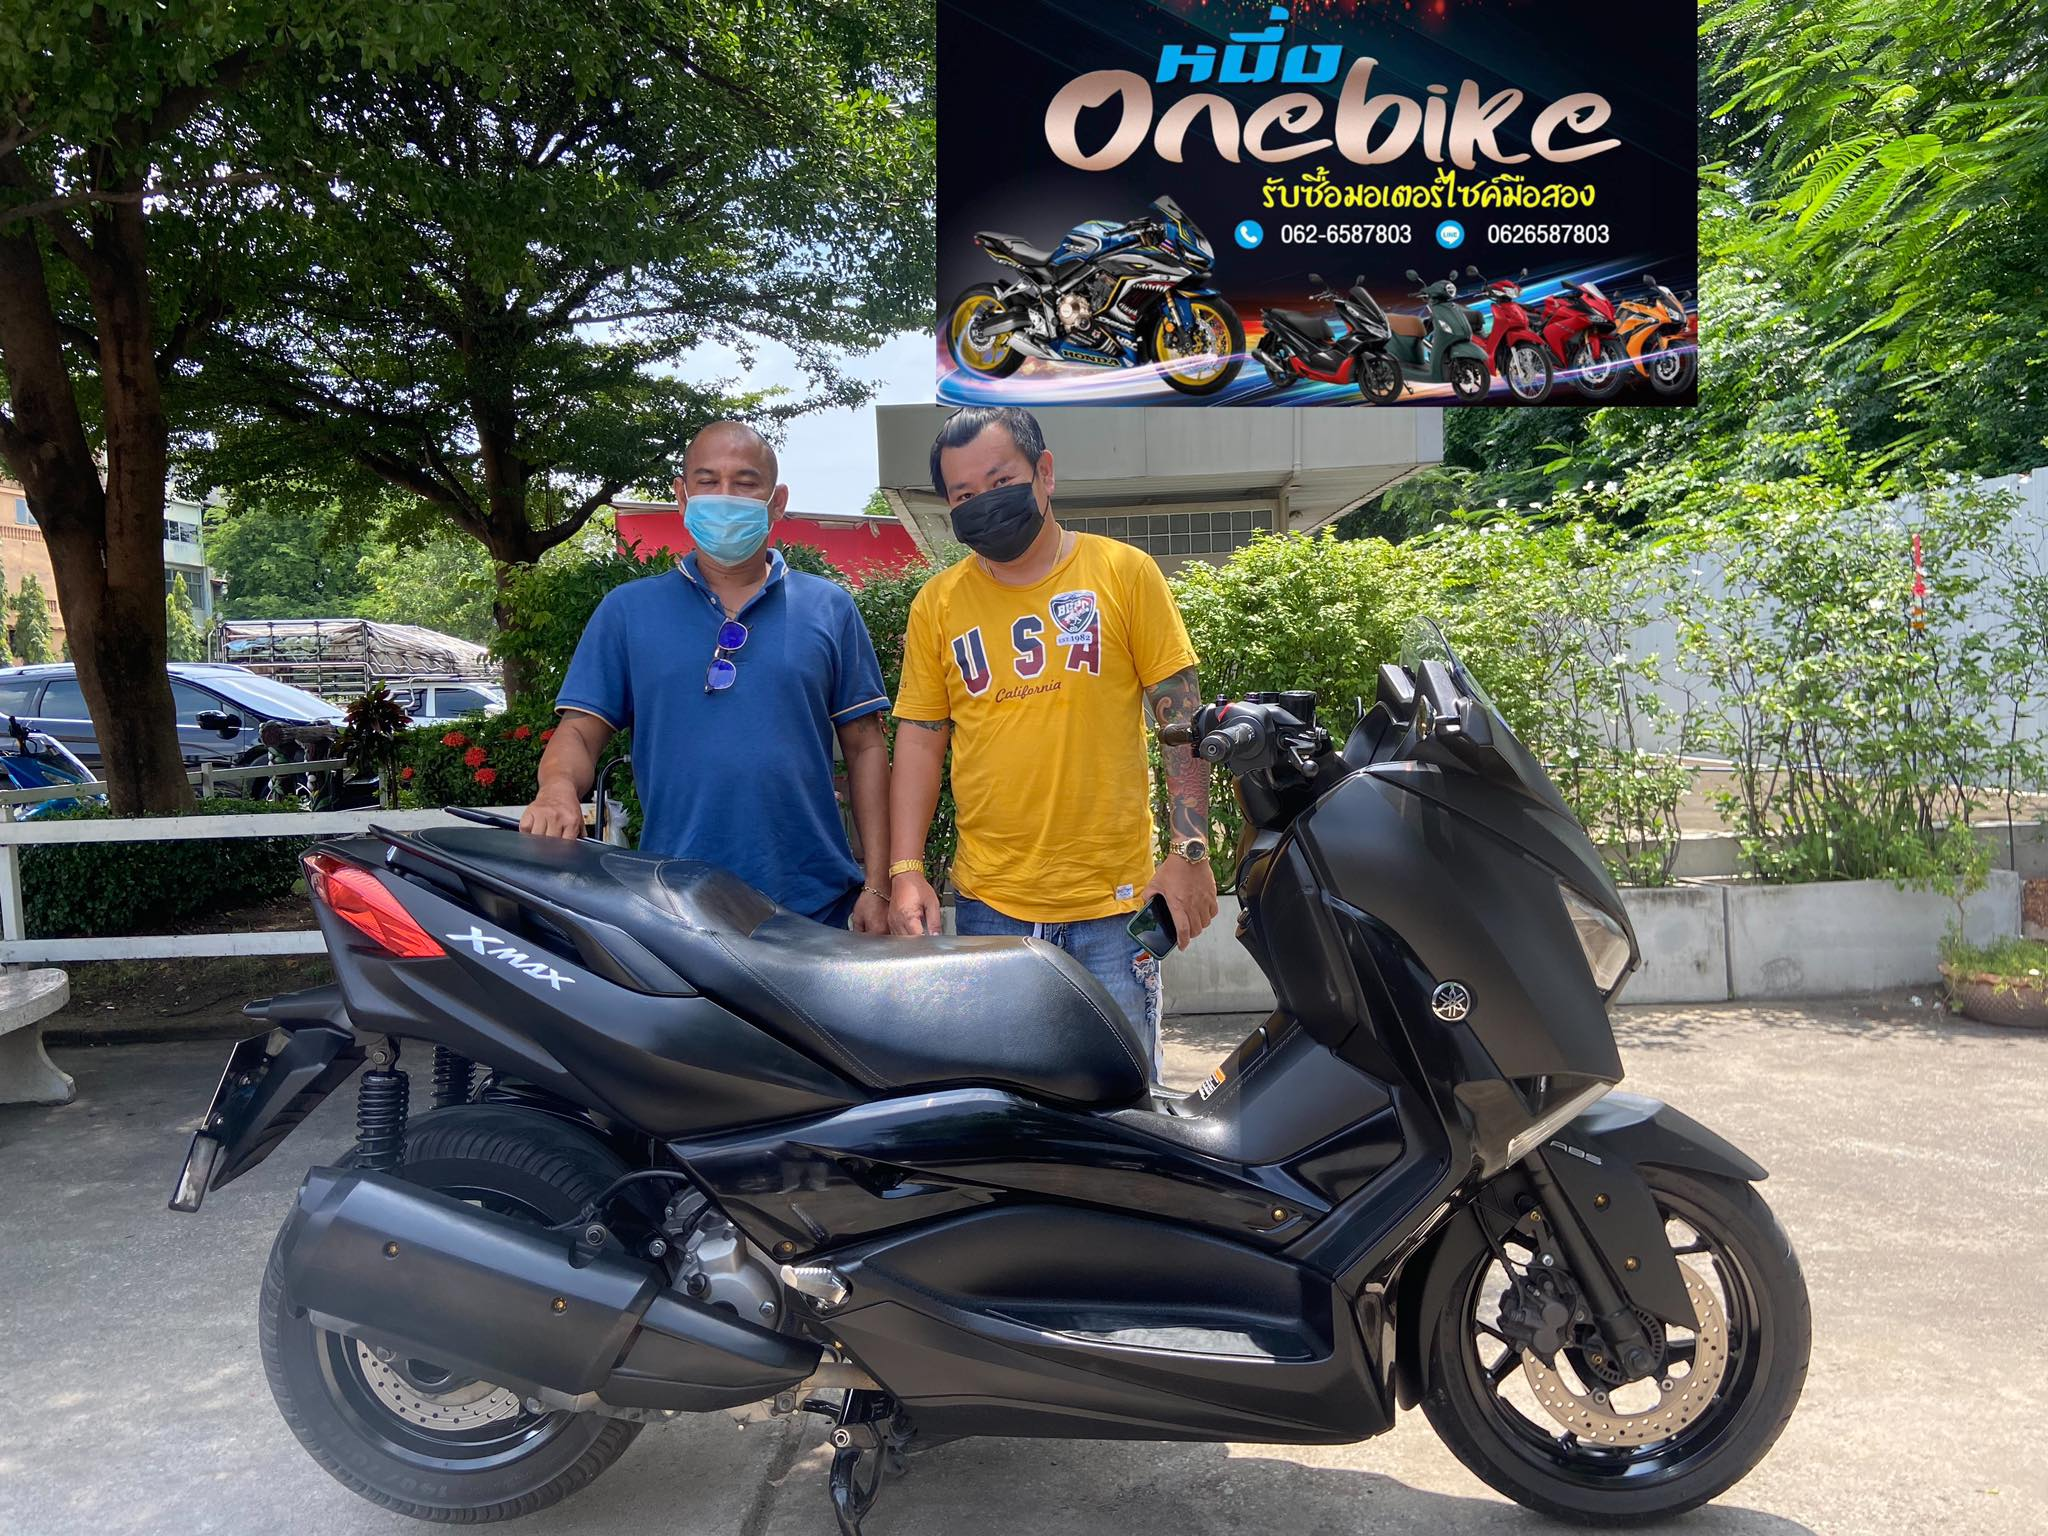 ONEBIKE รับซื้อมอเตอร์ไซค์มือสอง